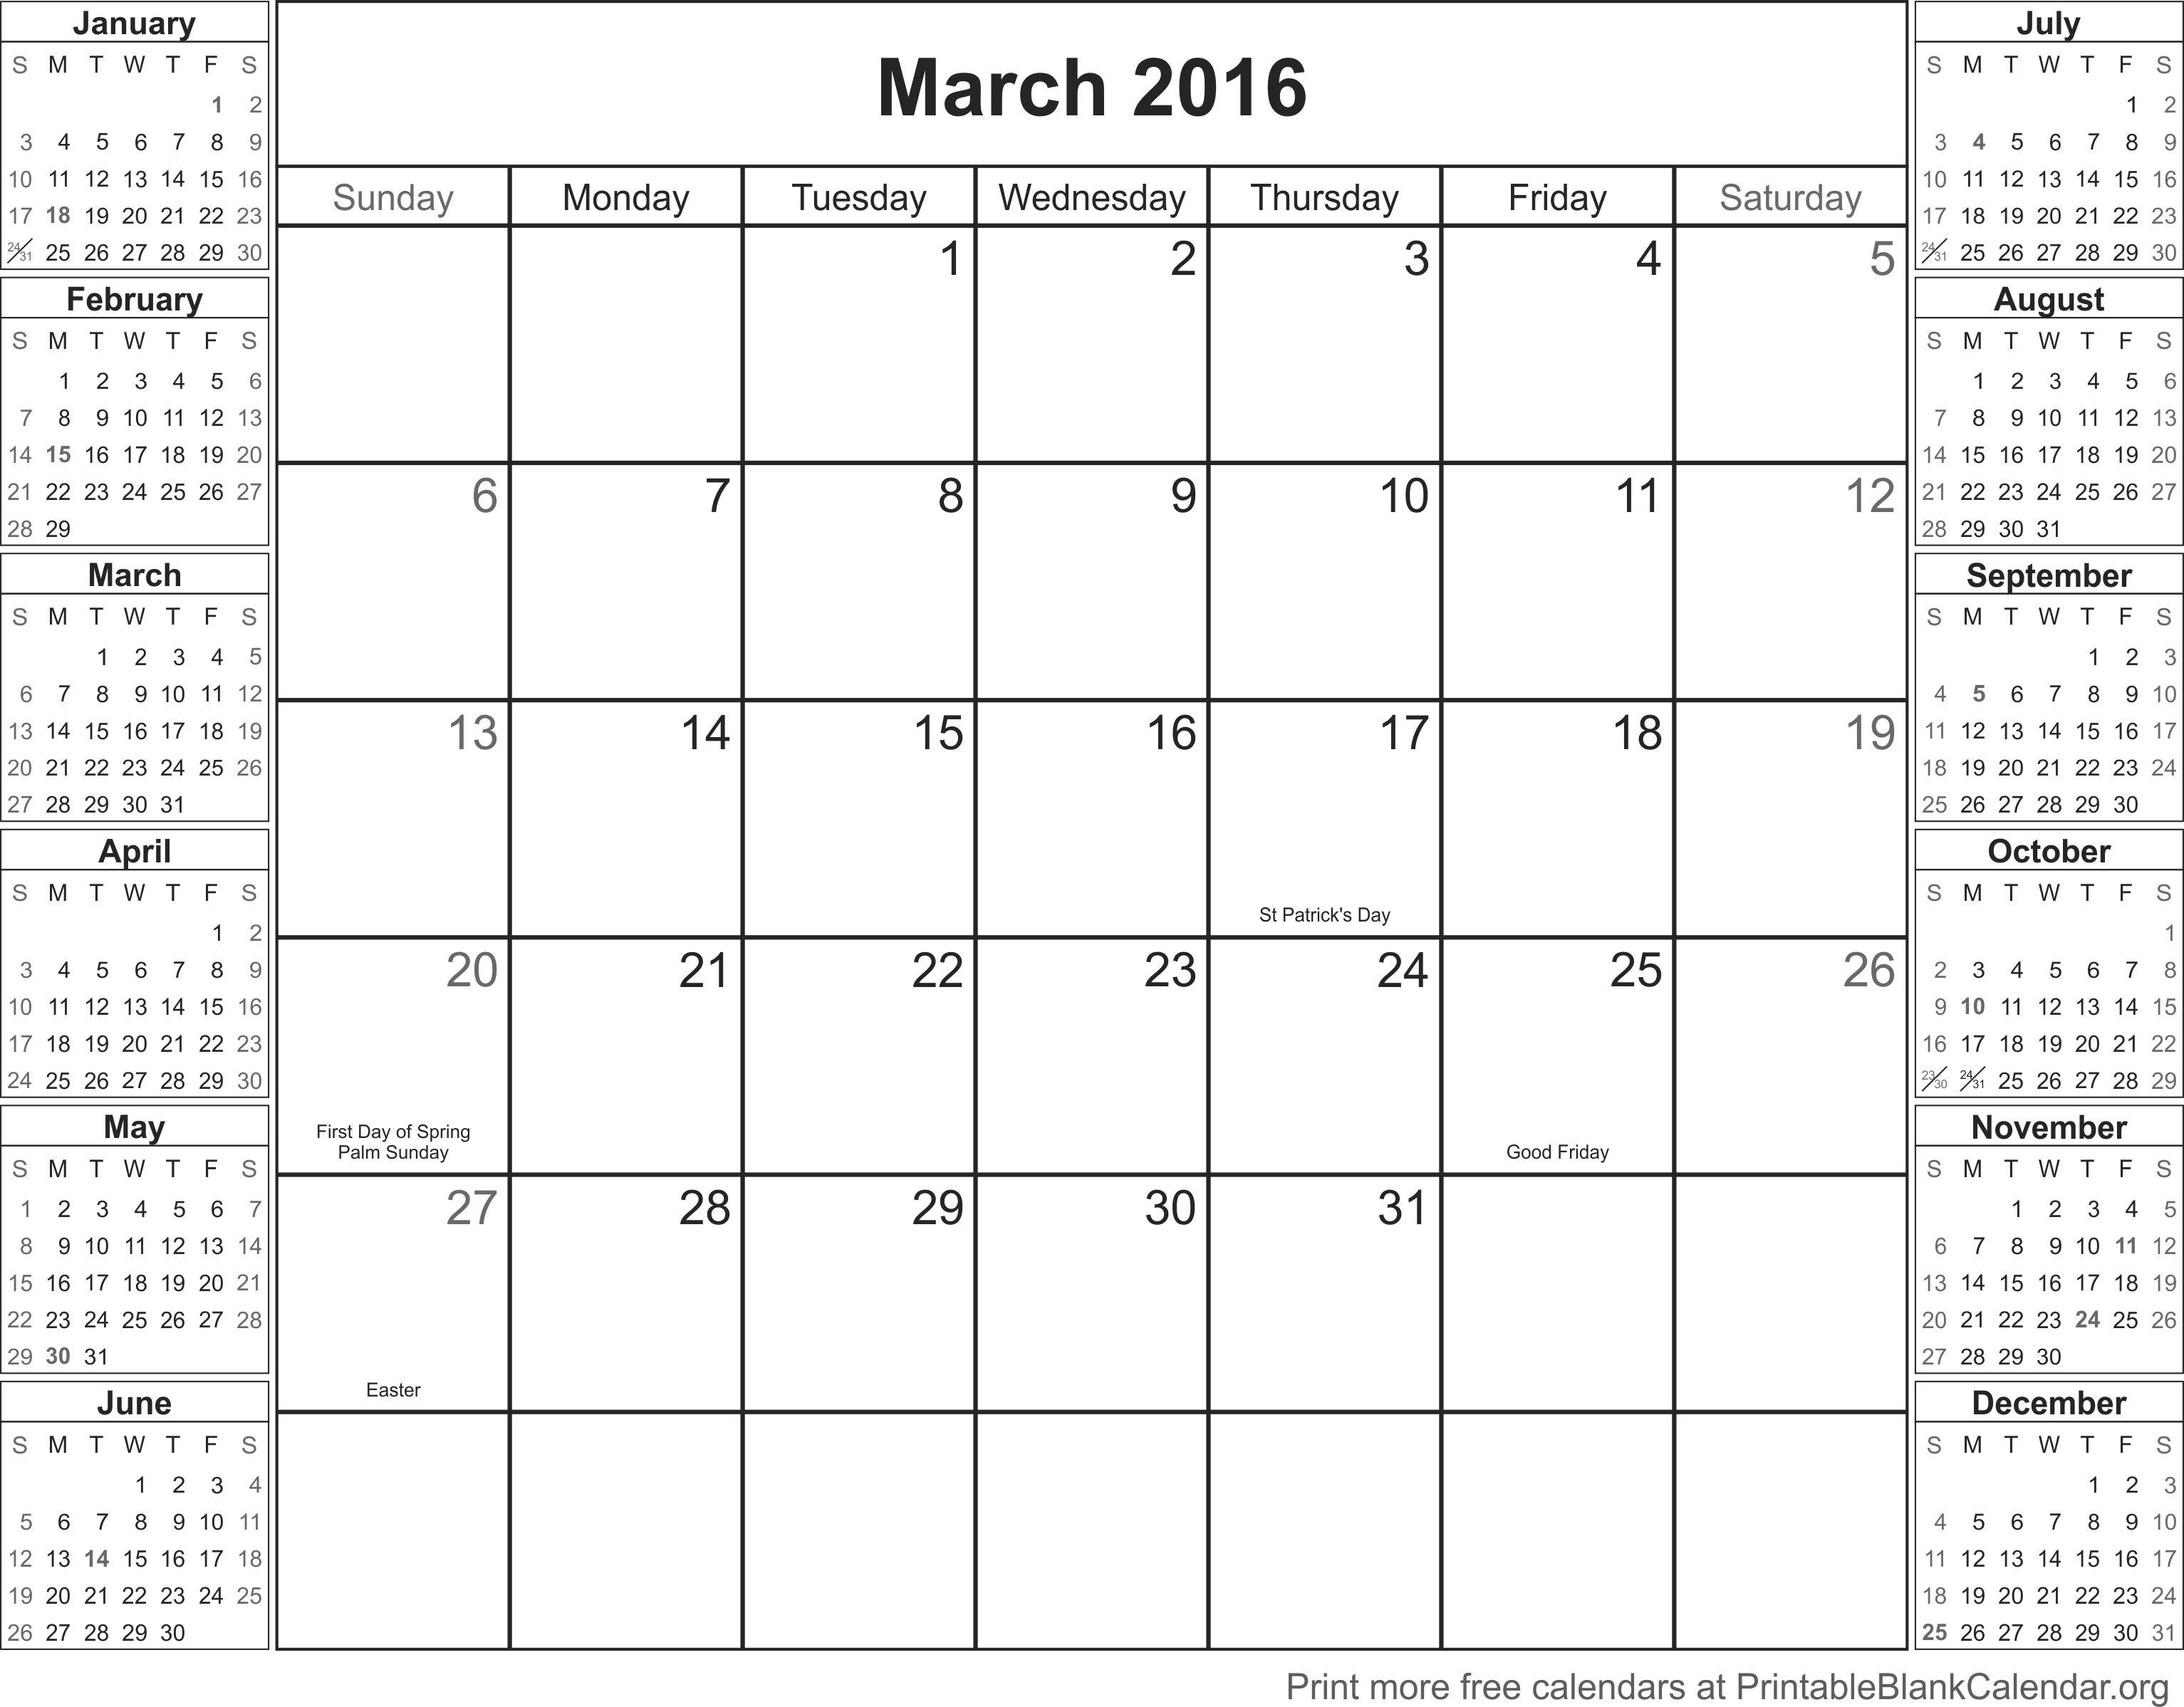 March 2016 Printable Blank Calendar Printable Blank Calendarorg – Printable Blank Calendar